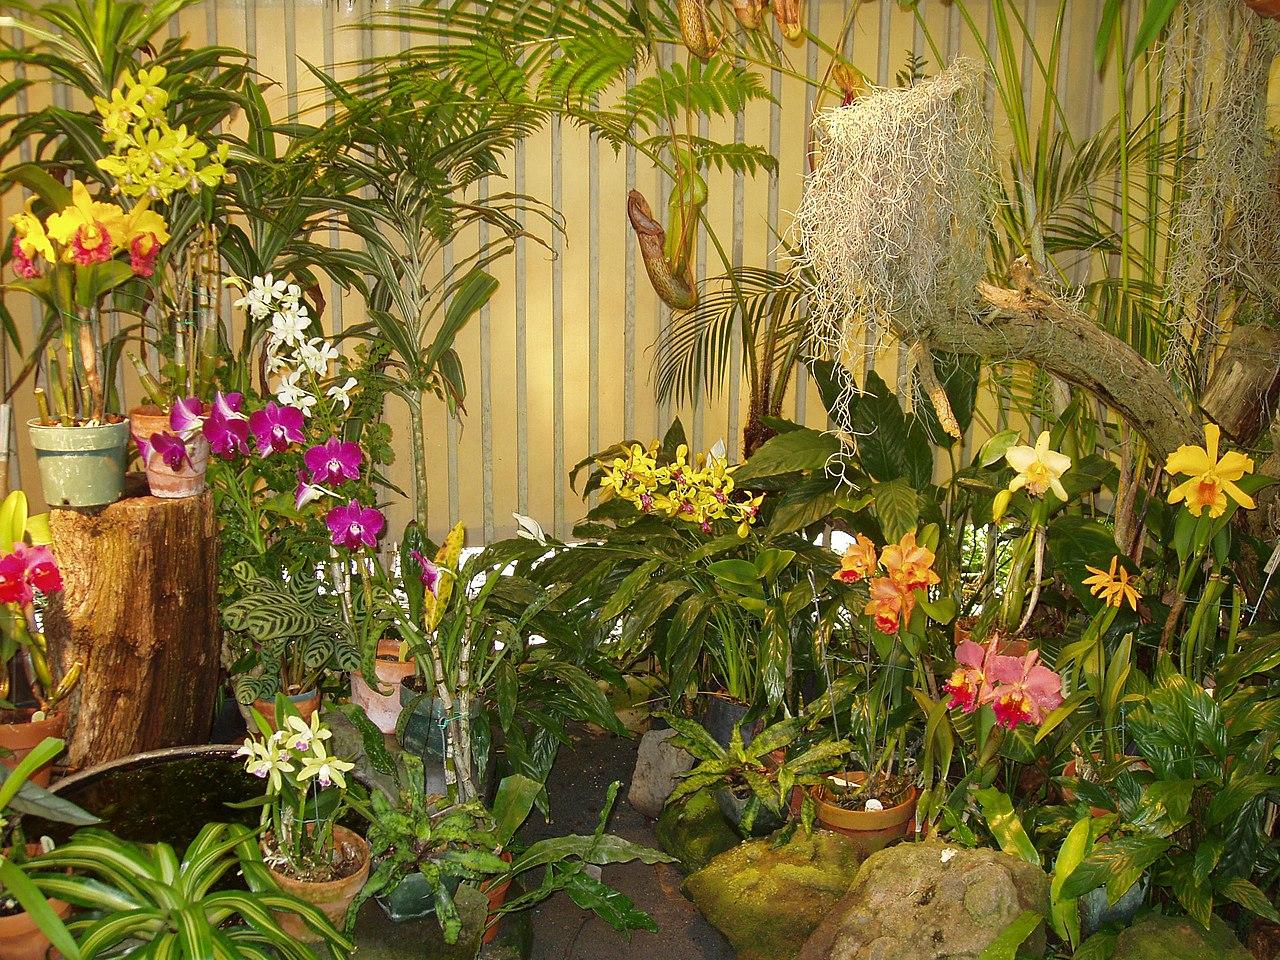 File foster botanical garden orchid display honolulu hi jpg wikipedia for Foster botanical garden honolulu